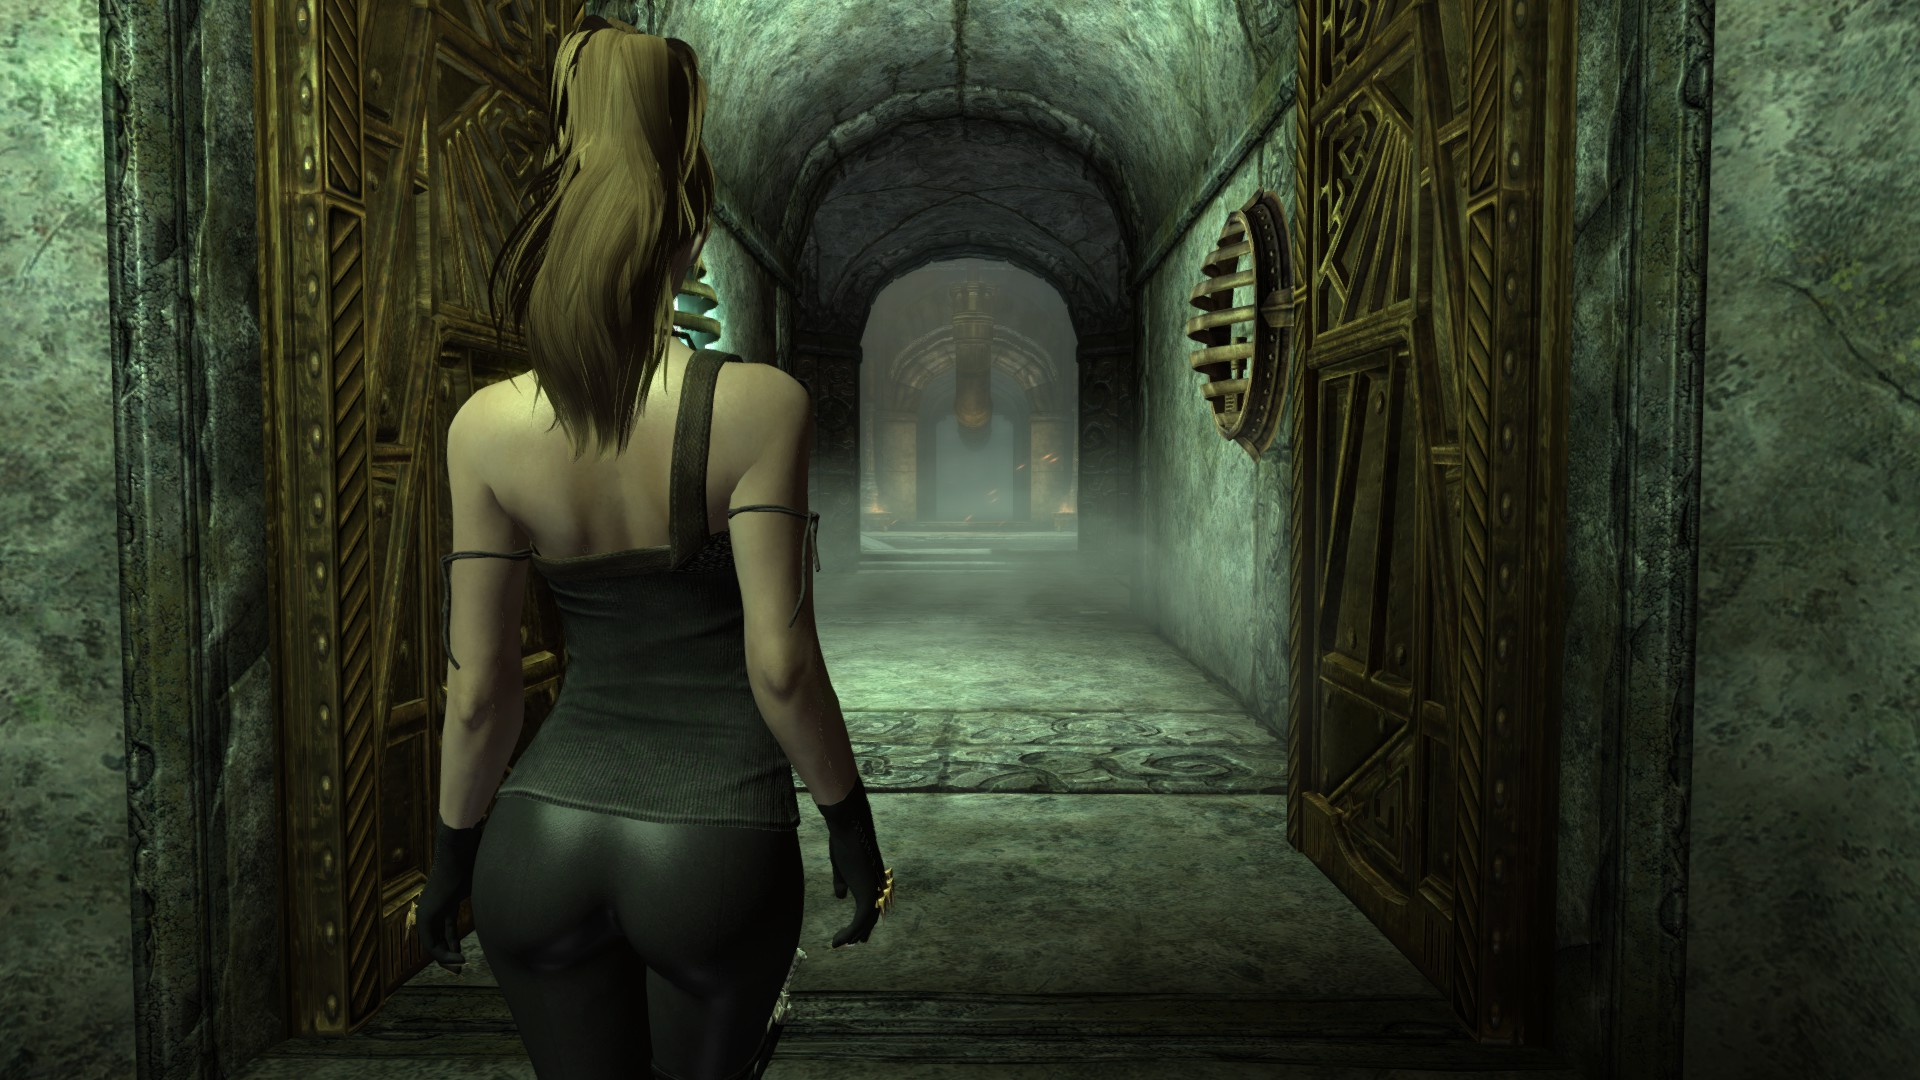 20180721190131_1.jpg - Elder Scrolls 5: Skyrim, the